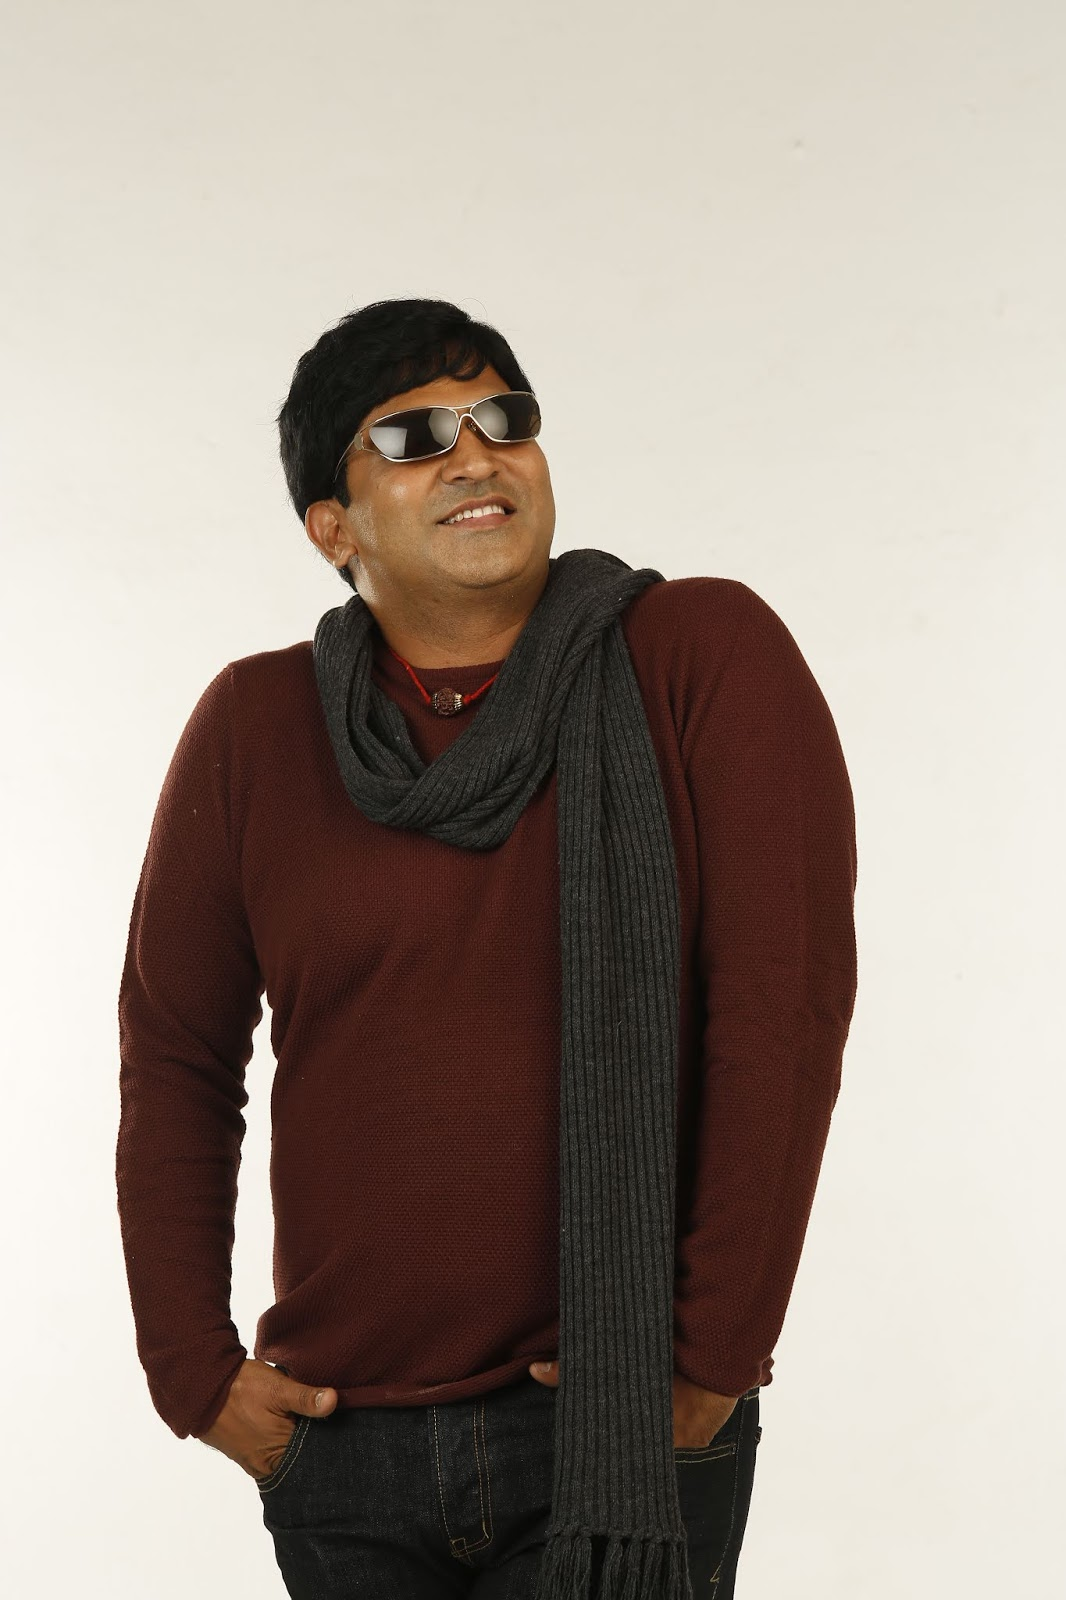 Vaibhav Reddy's Elder Brother Sunil Debuts in Vijay Sethupathi's Seethakathi movie